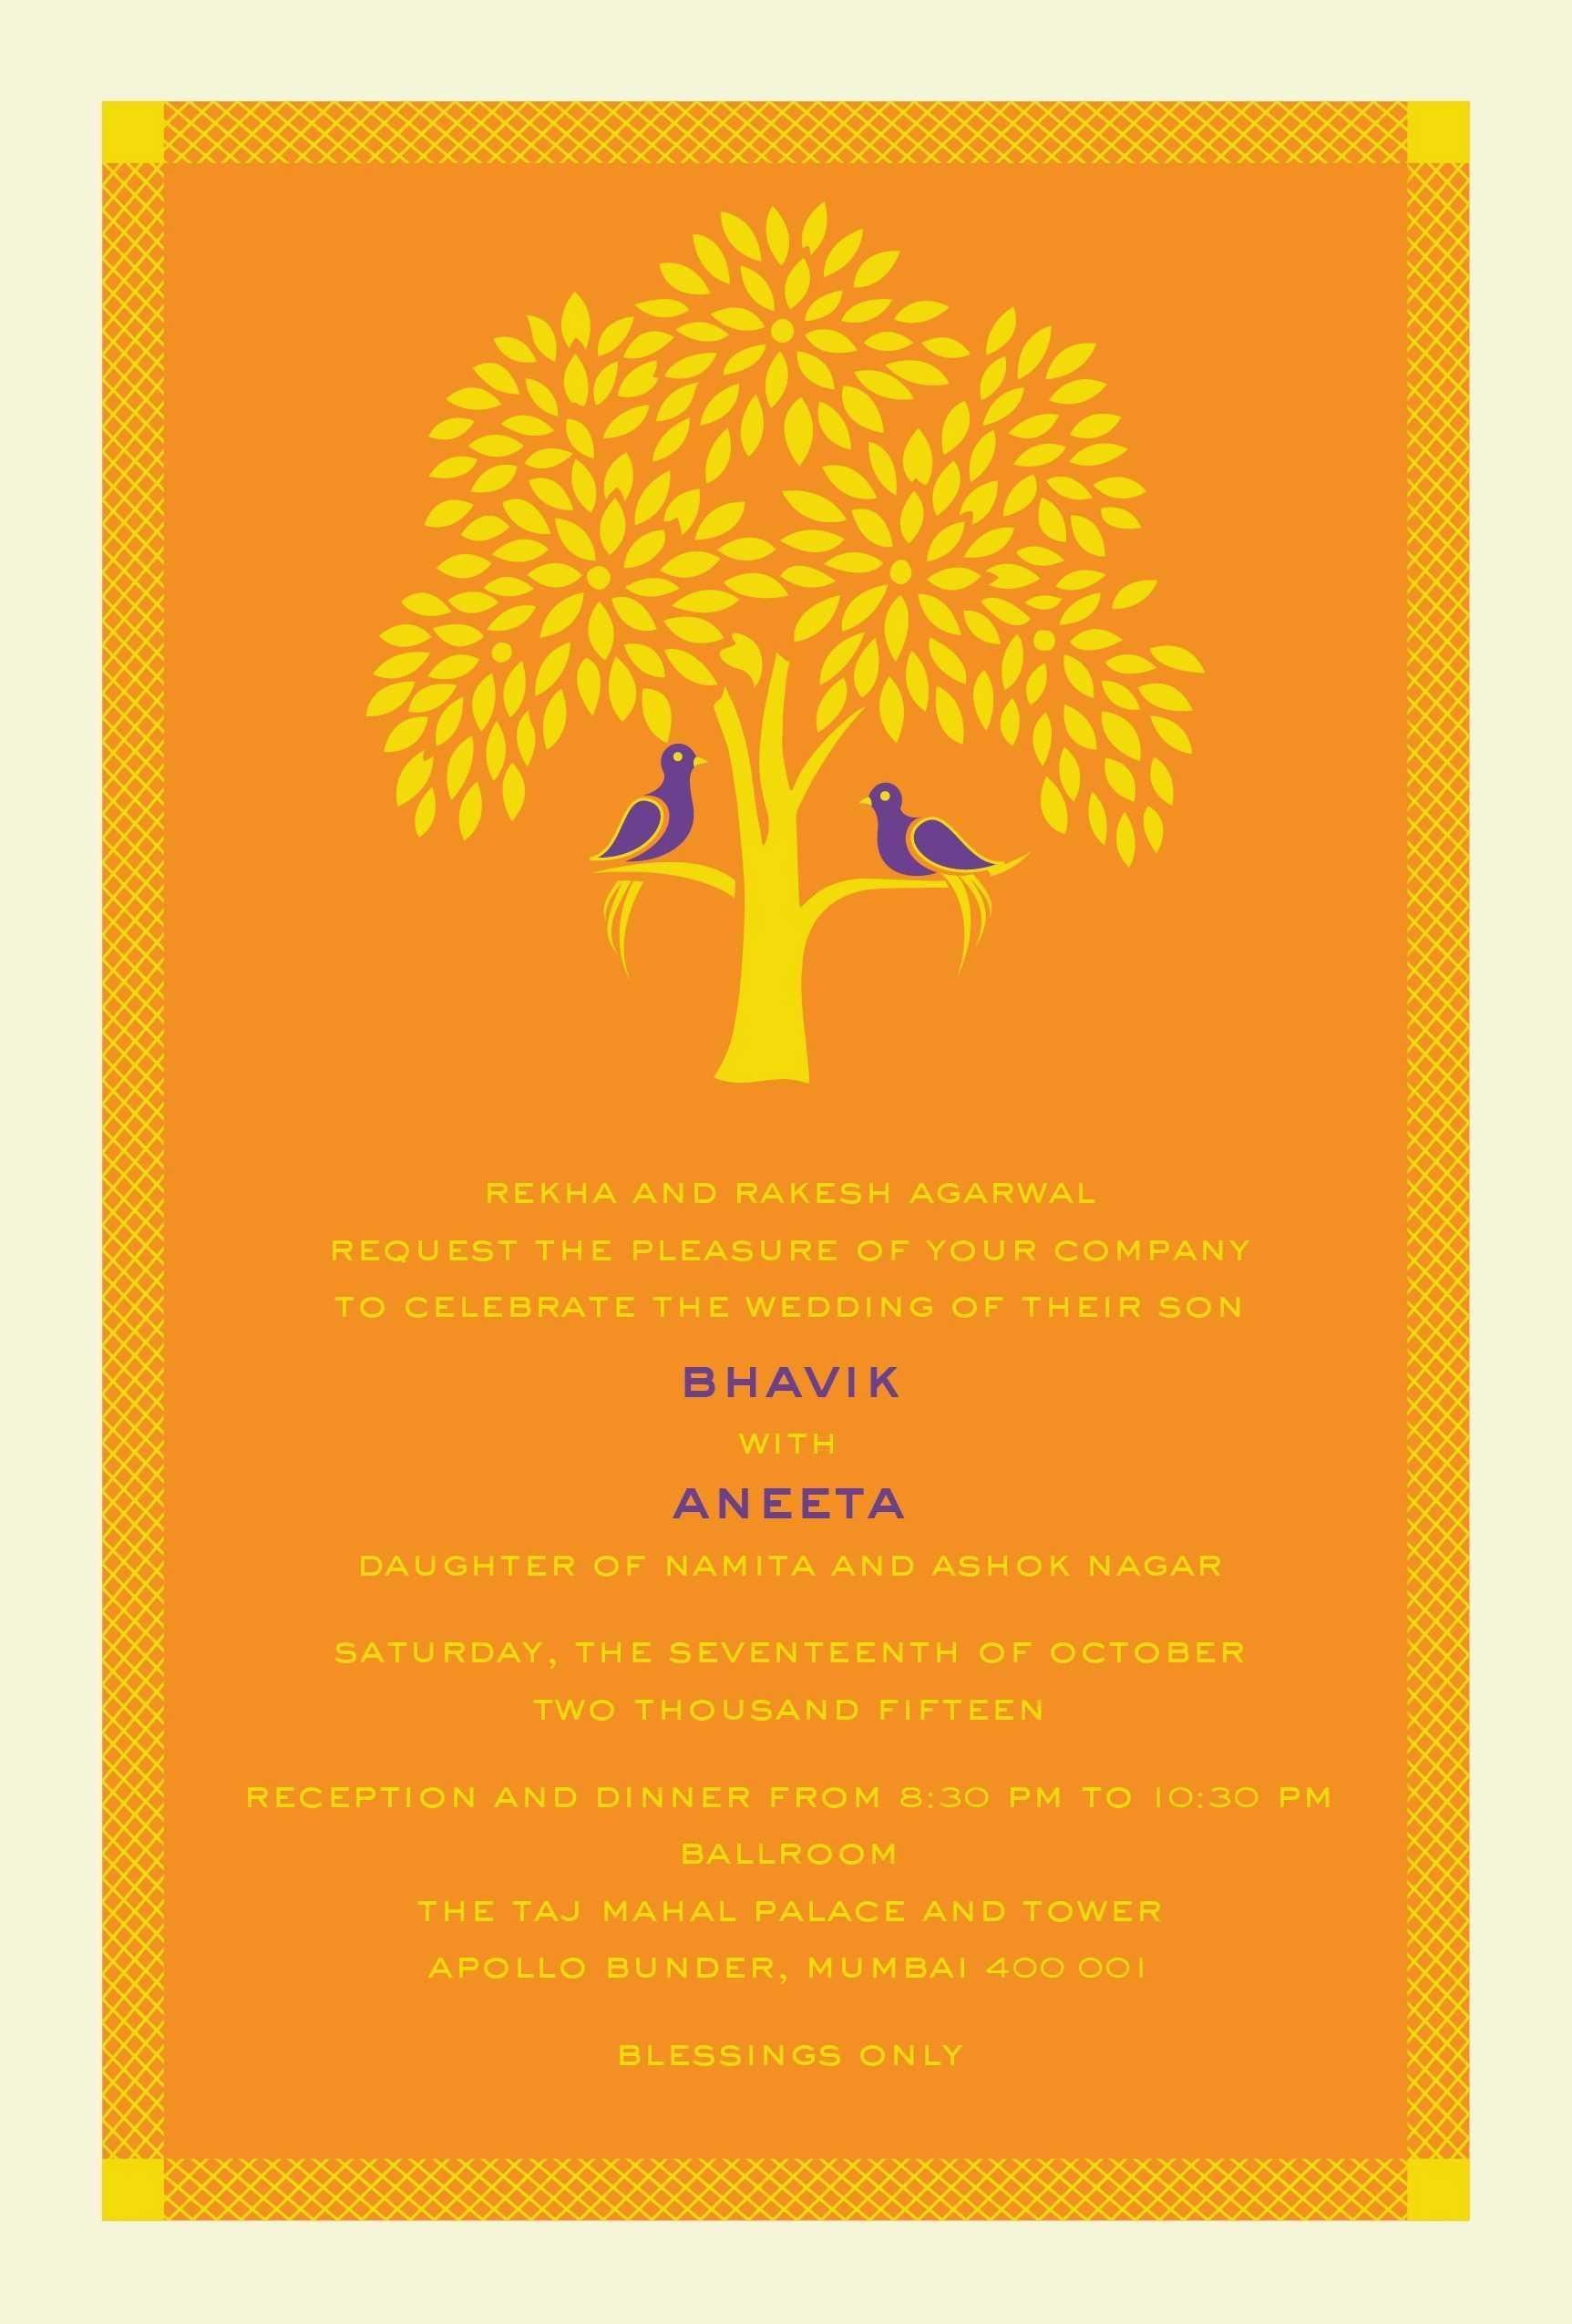 Hindu Wedding Invitation Cards Designs Templates